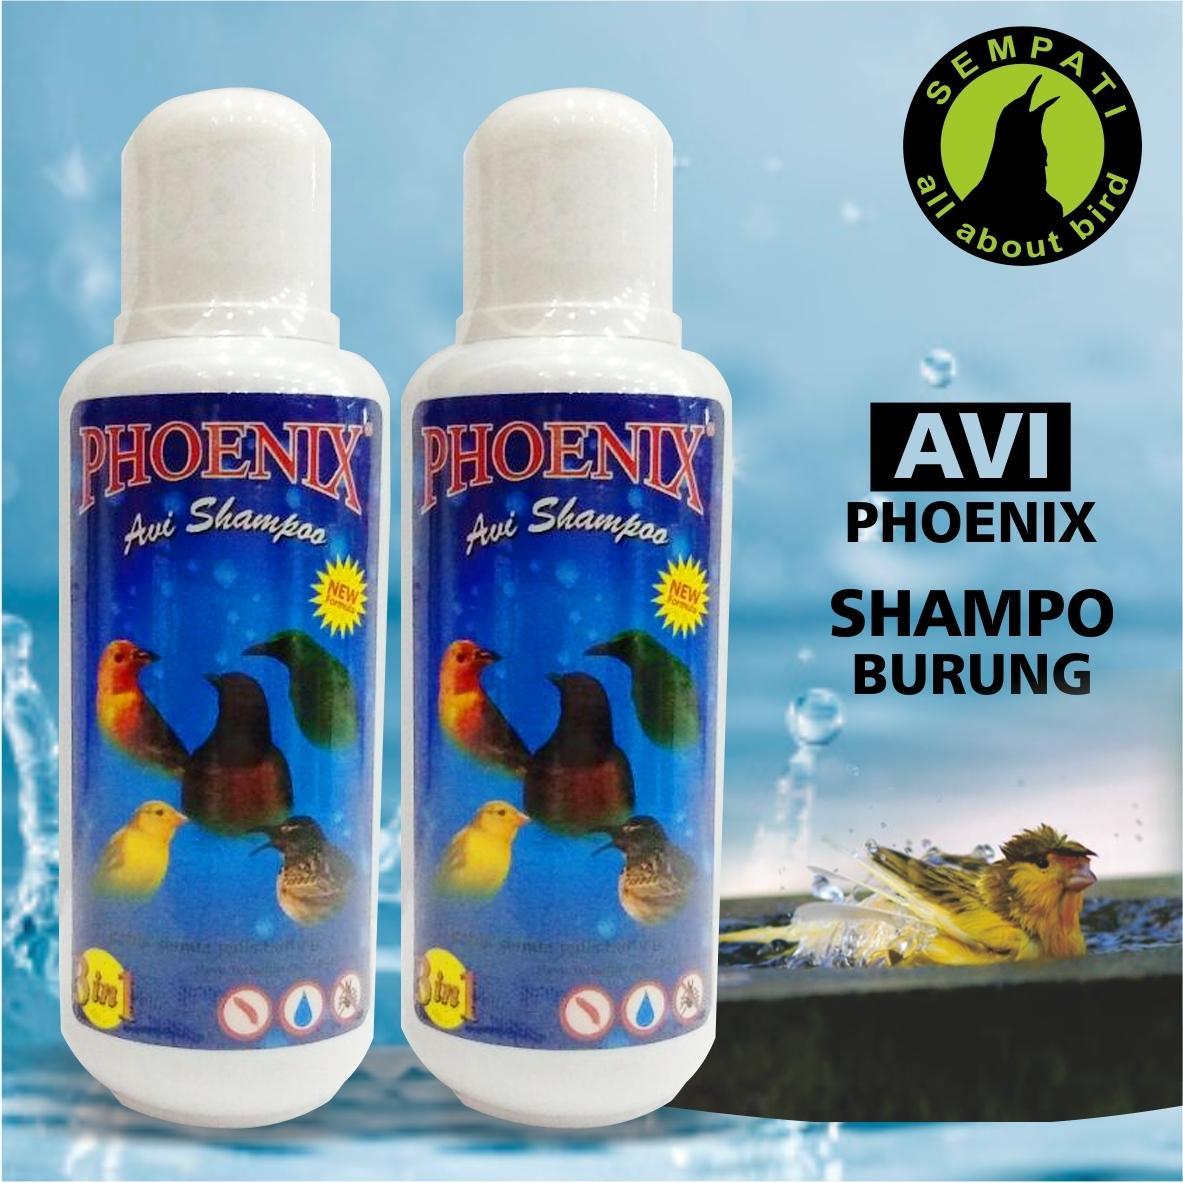 Buy Sell Cheapest Shampo Pembasmi Kutu Best Quality Product Deals Shampoo Rambut Nabila Sampo Original Avi Phoenix Obat Burung